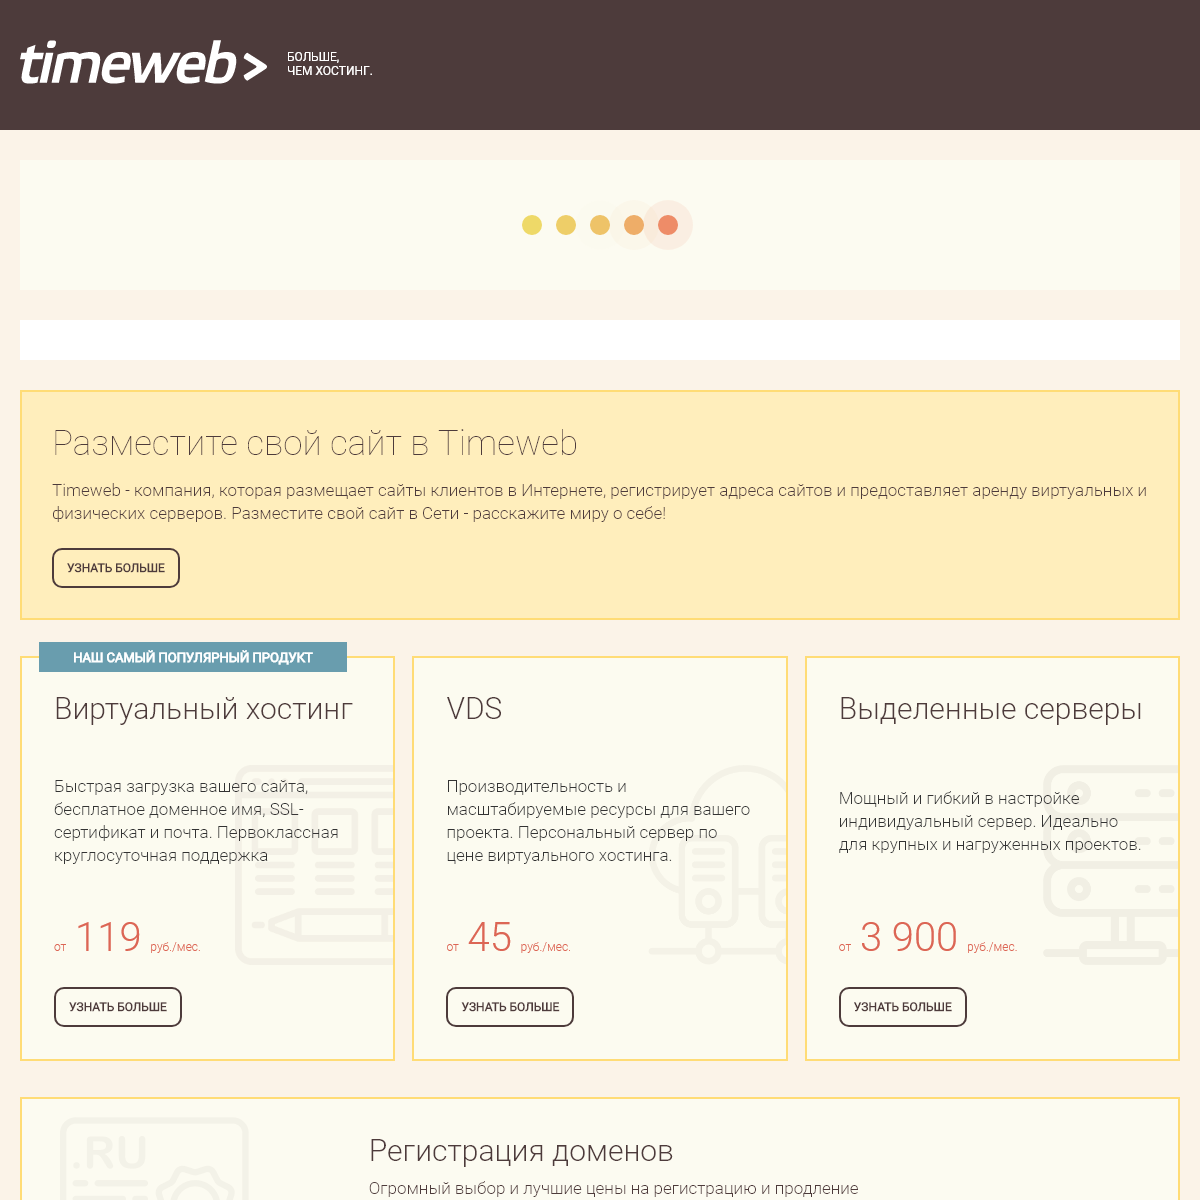 Этот домен припаркован компанией Timeweb